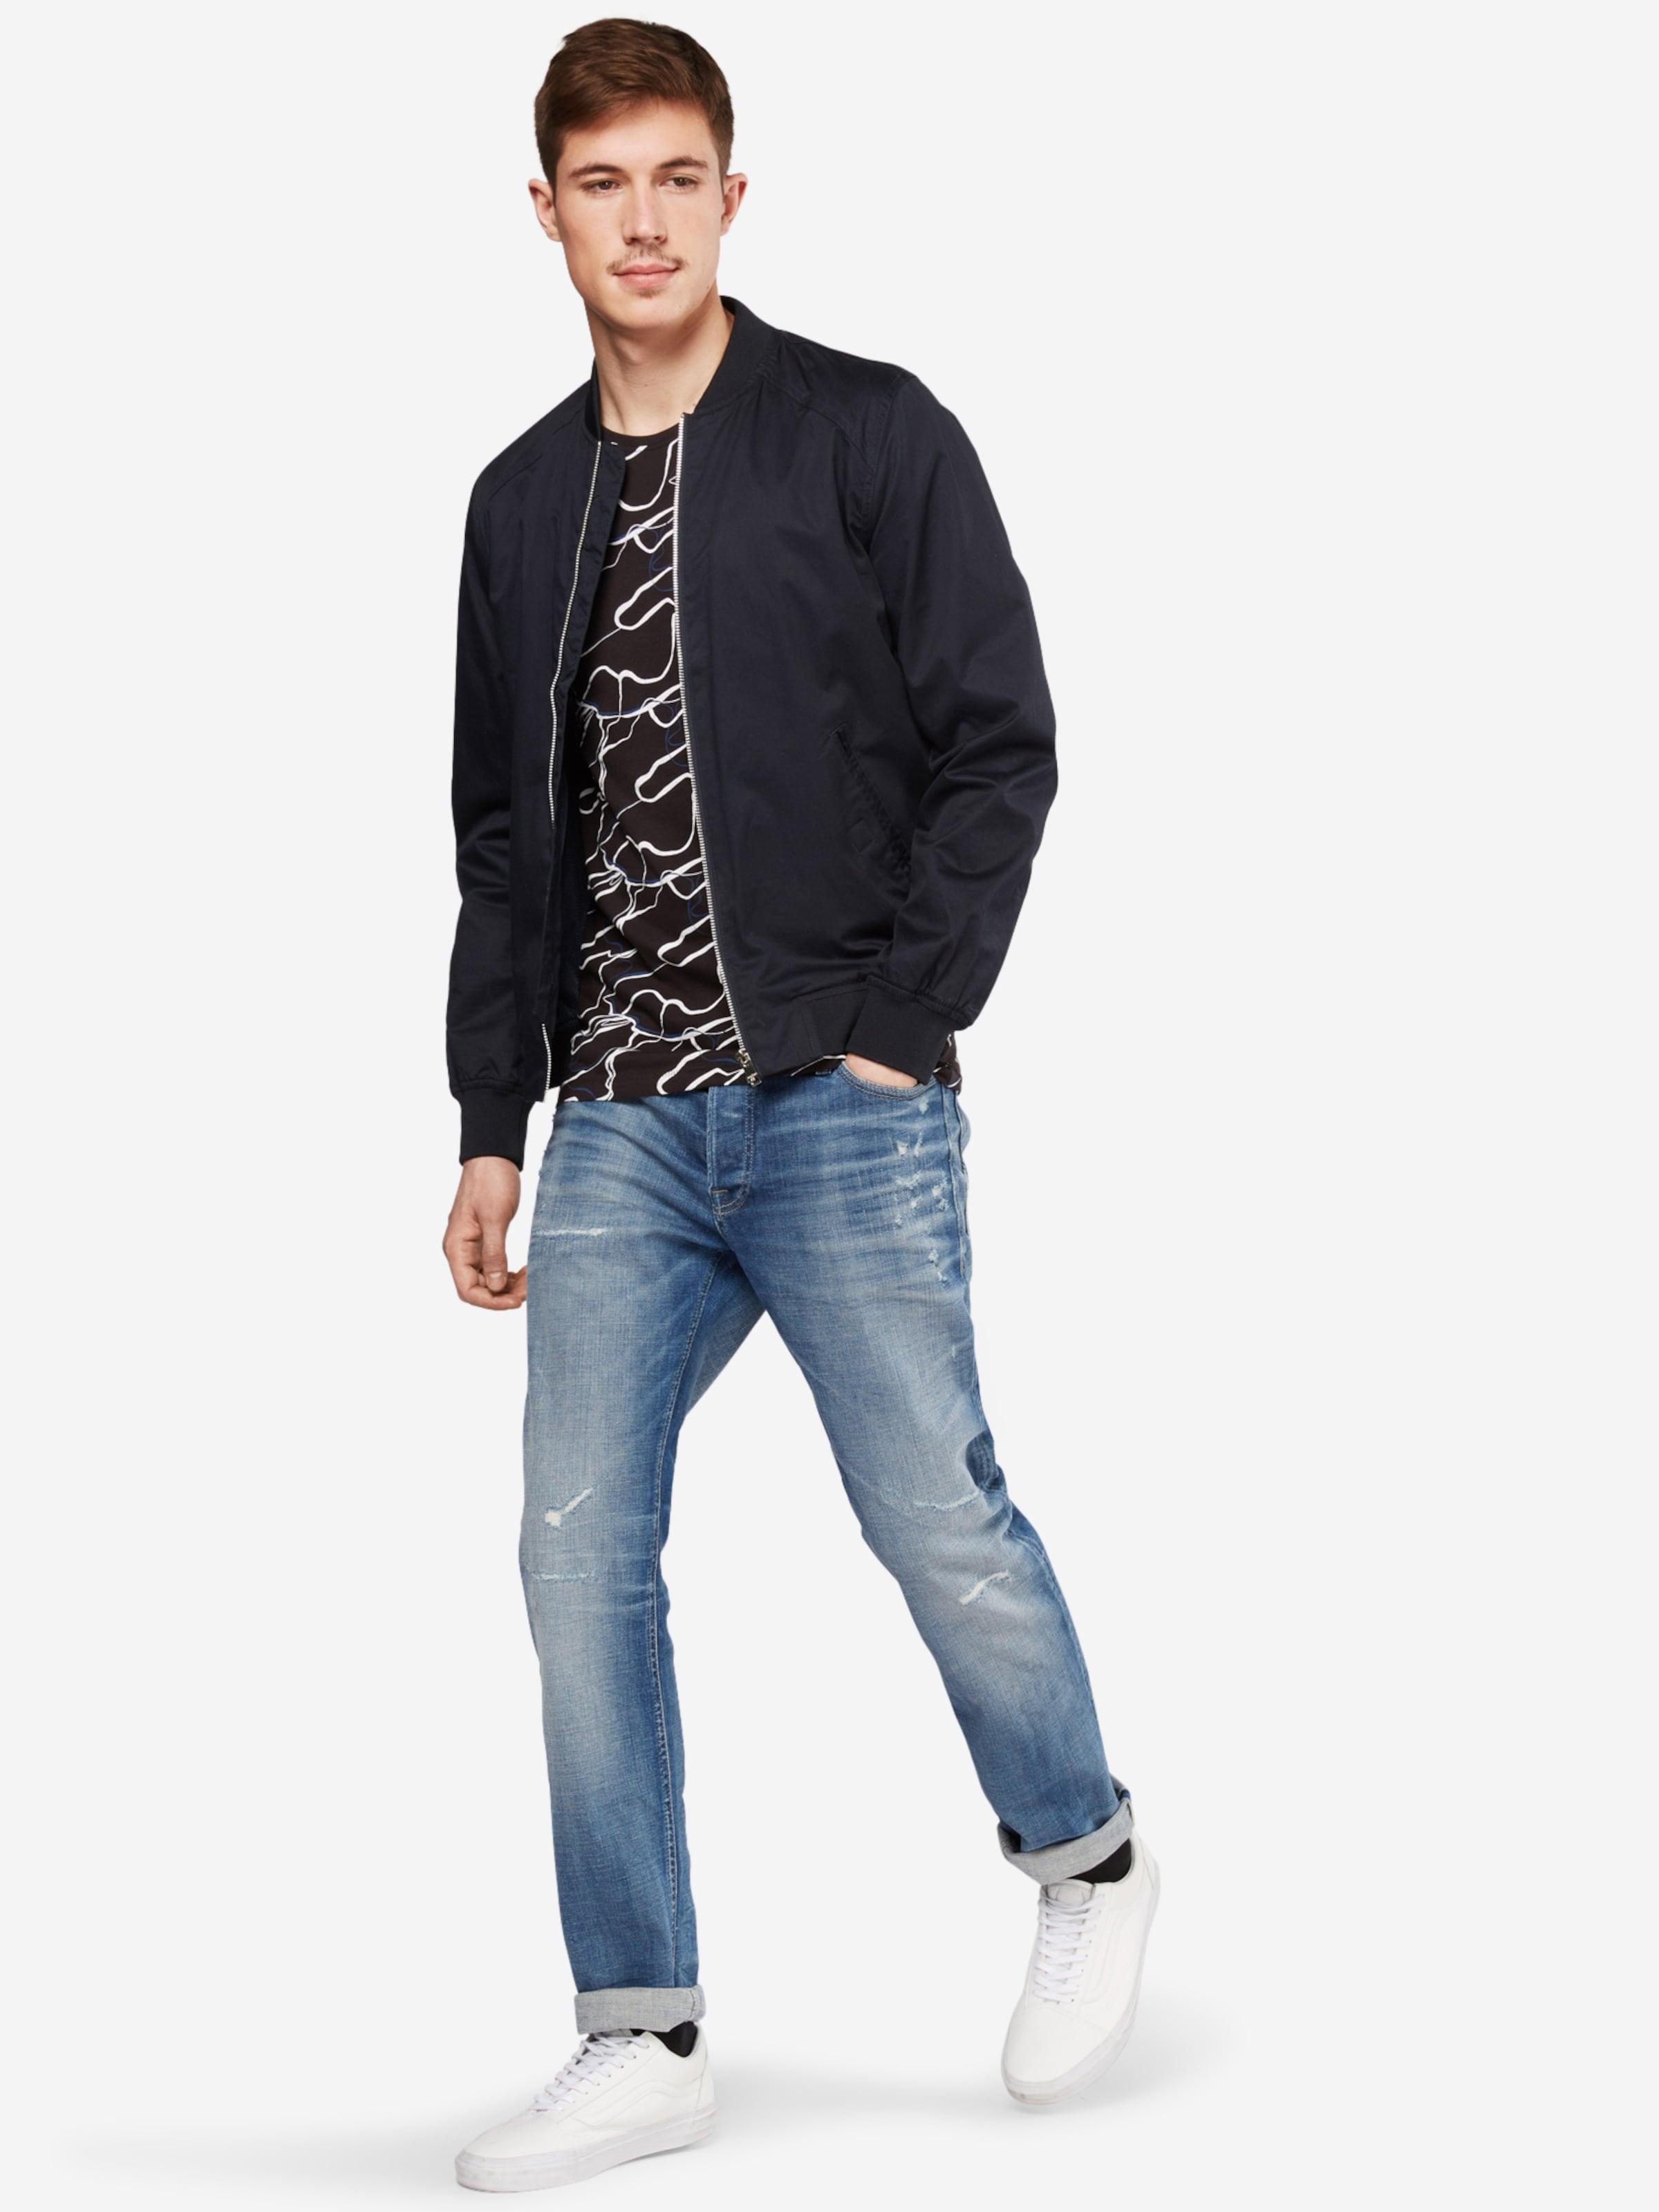 Billig Verkauf Großer Verkauf Only & Sons T-Shirt 'onsSCOTT AOP SS' 2018 Online Billig 2018 Neu Steckdose Neu Neuesten Kollektionen Günstiger Preis n00wGr